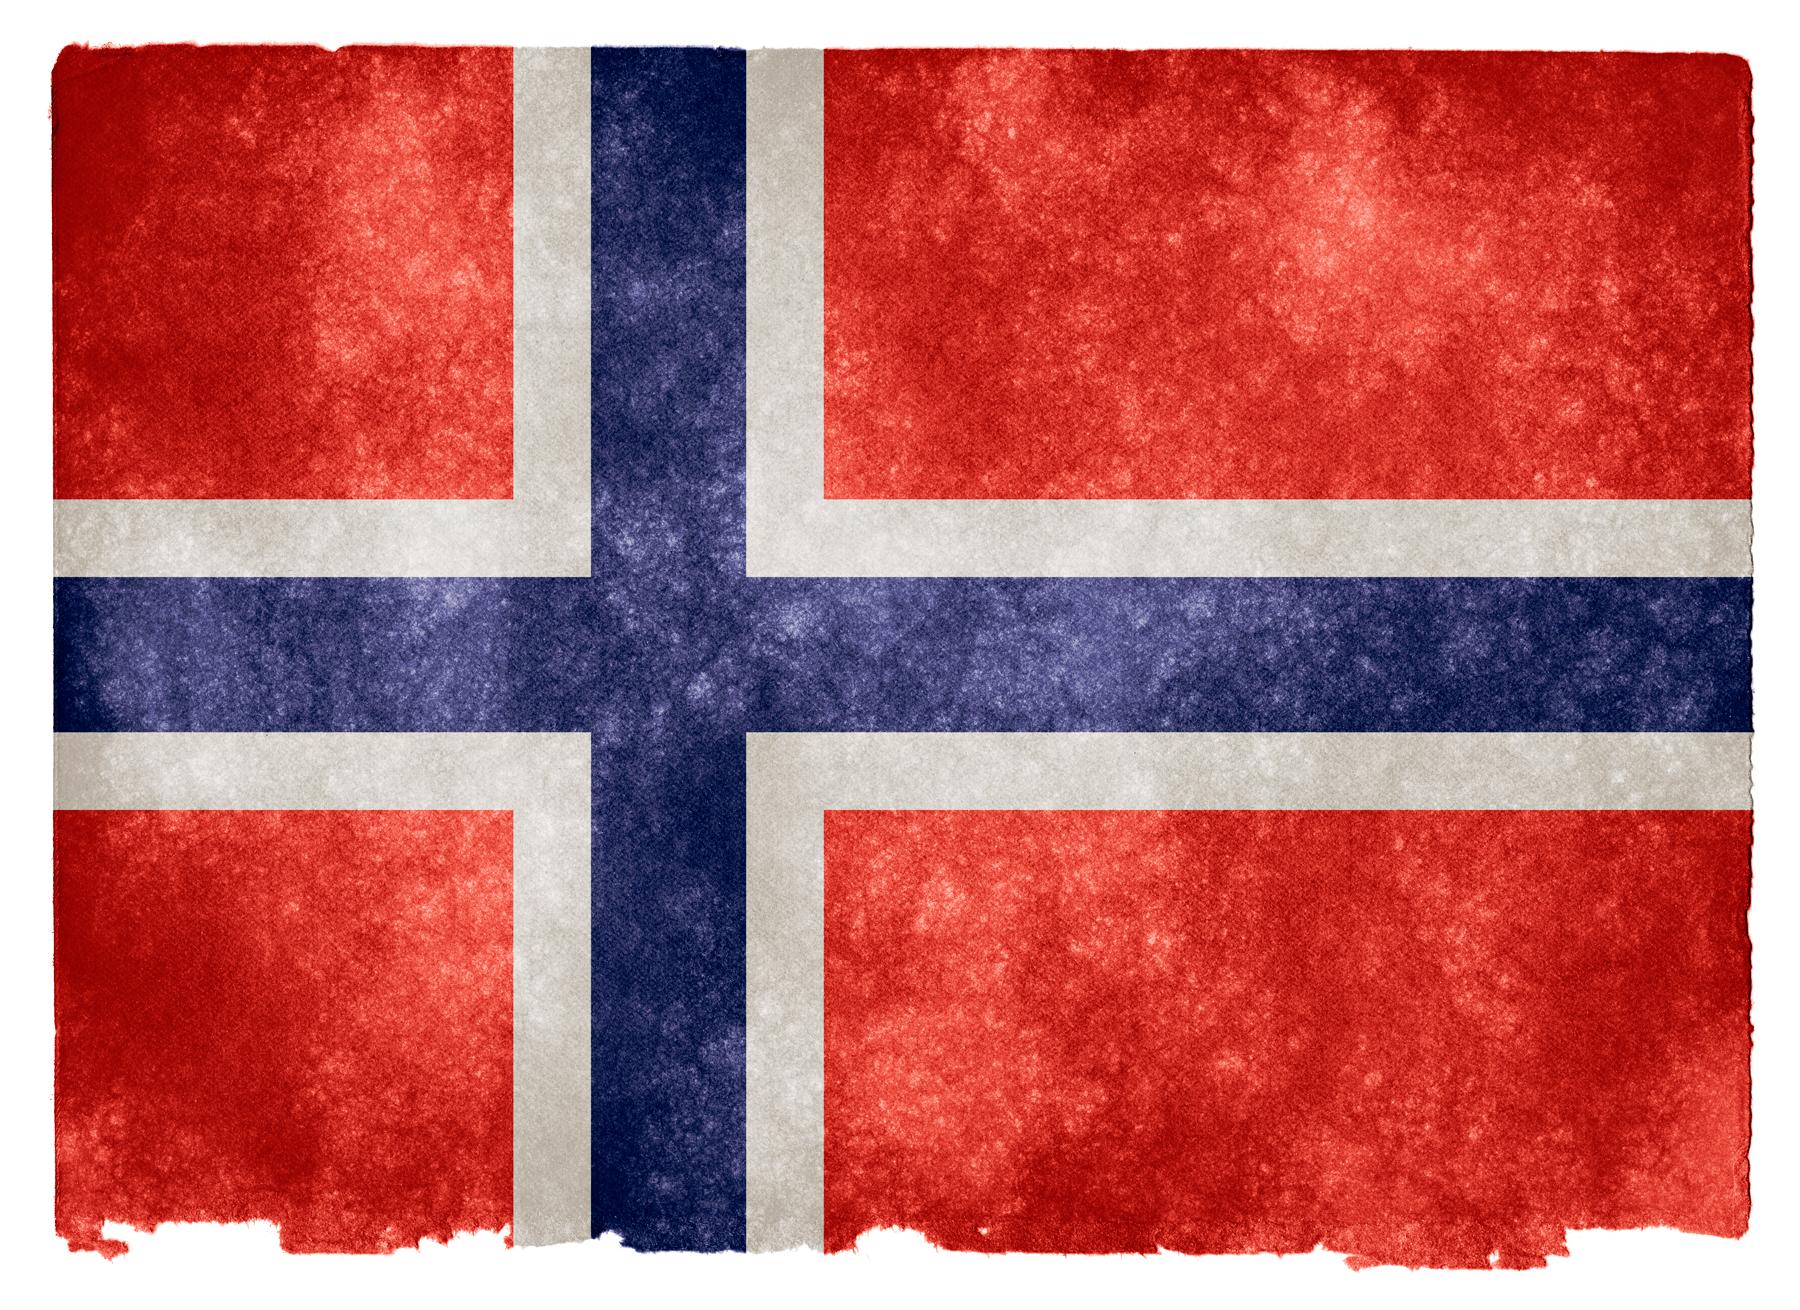 Norway Grunge Flag, Photo, Parchment, Picture, Proud, HQ Photo